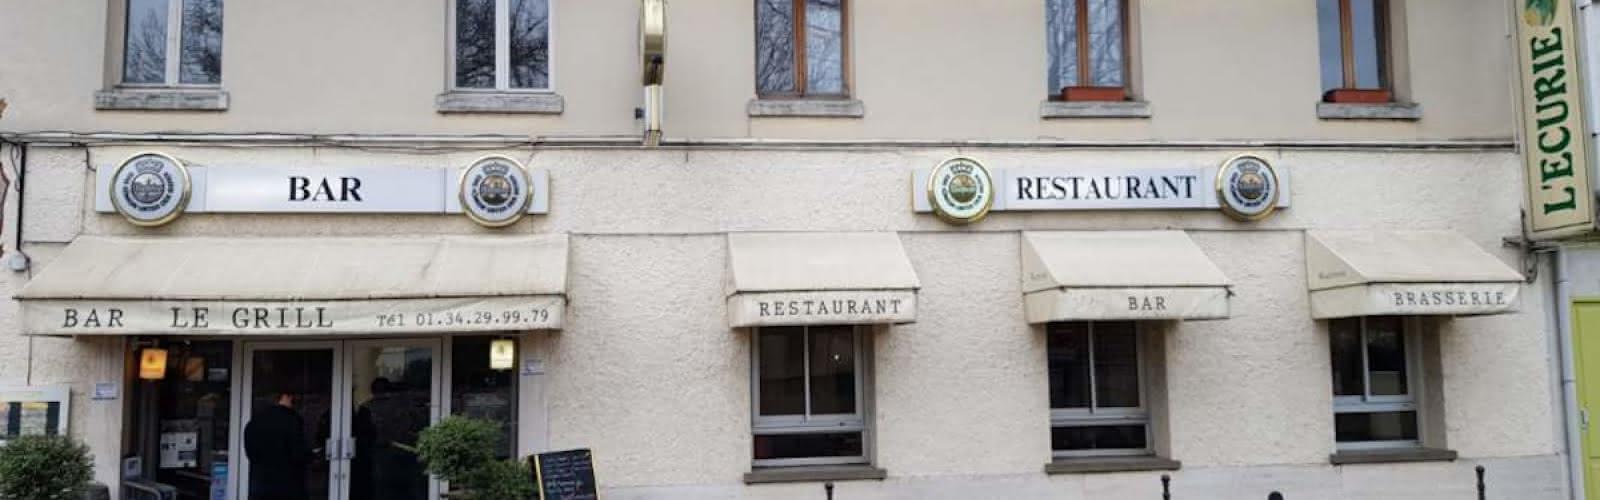 Le Grill, Roissy-en-France